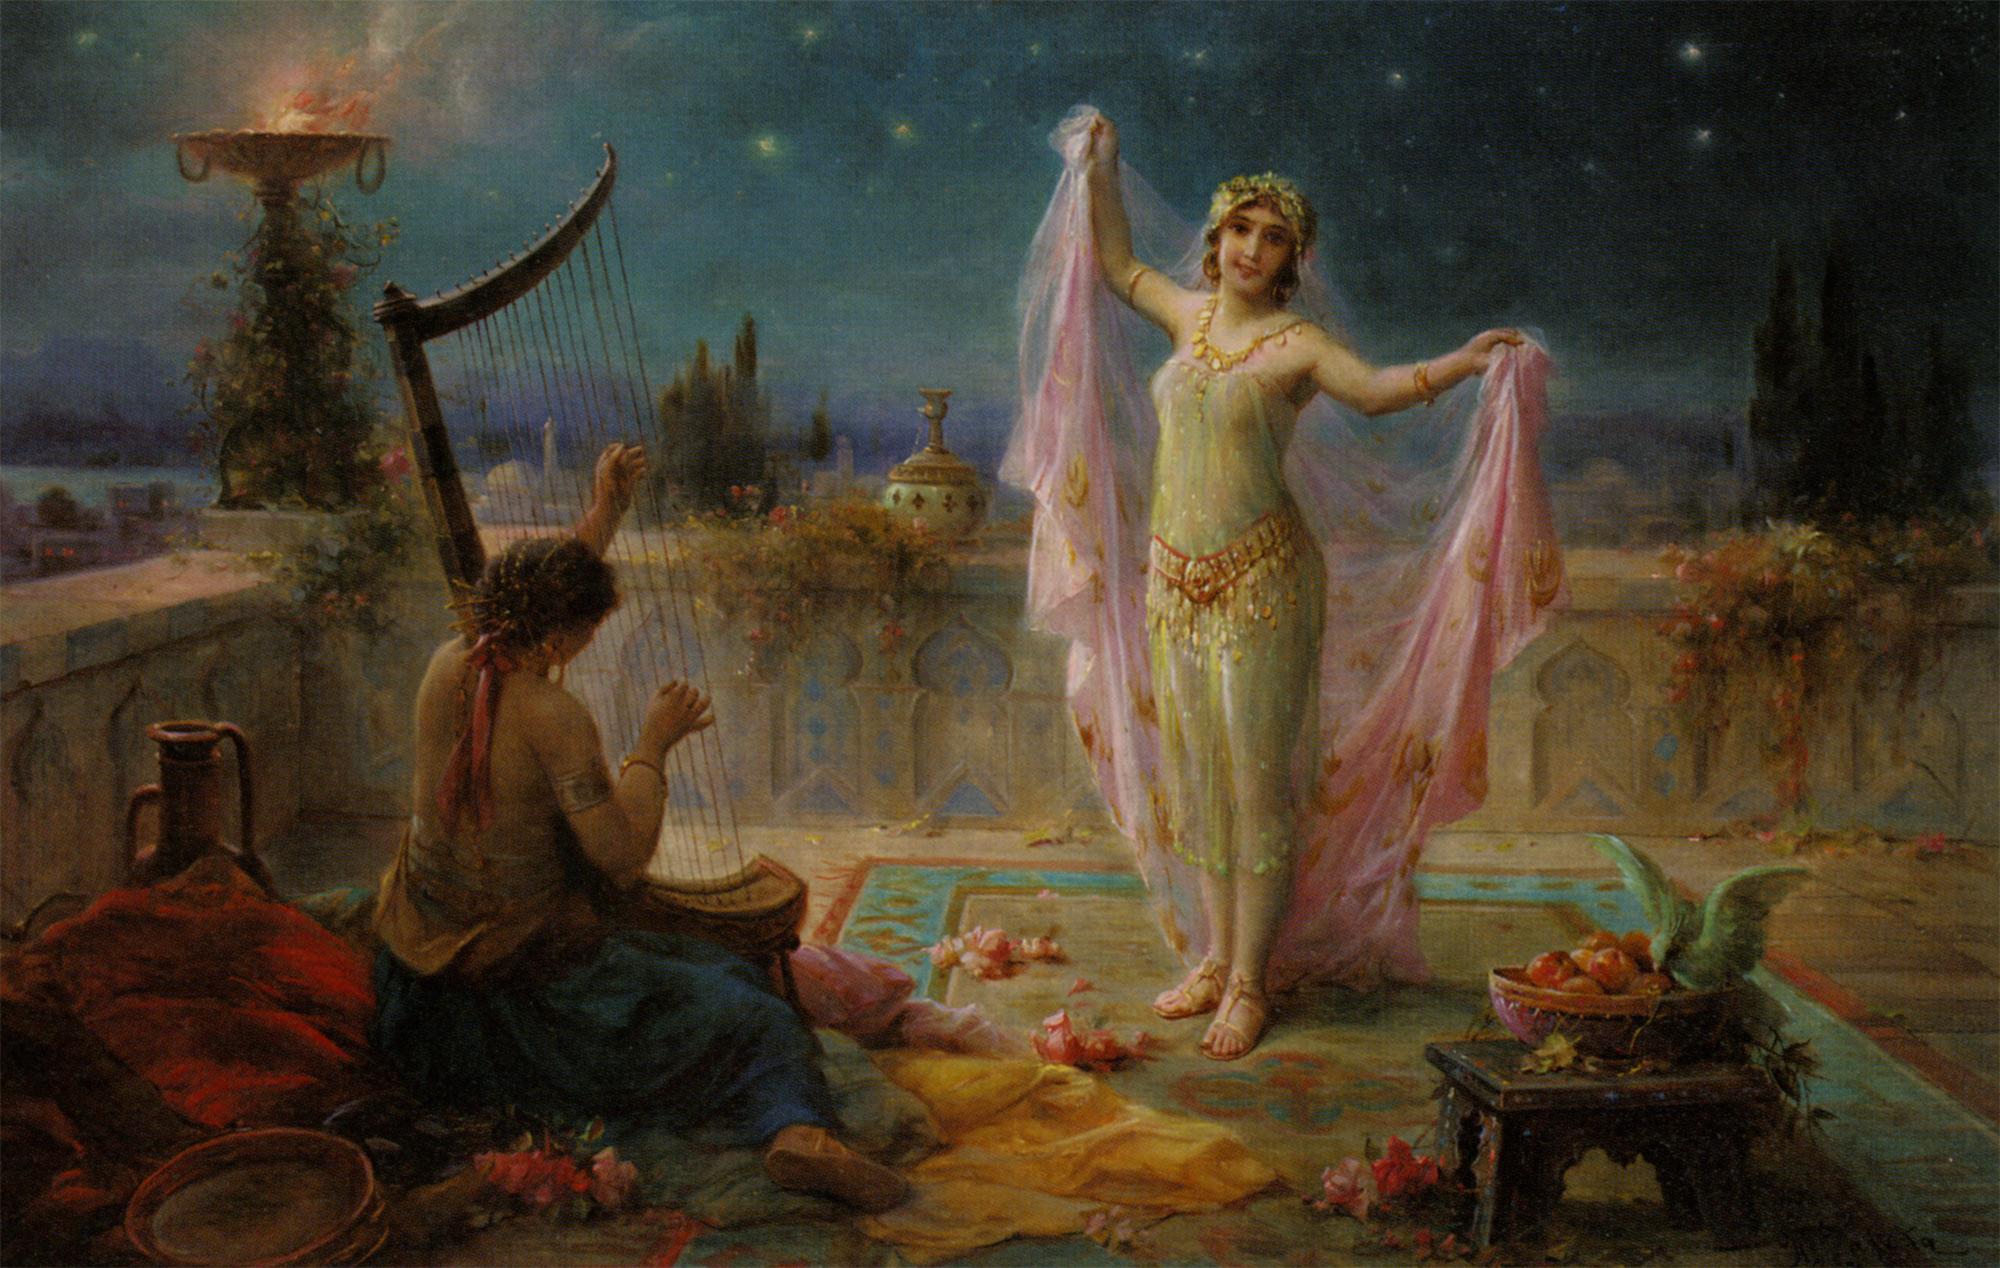 Moonlight Serenade :: Hans Zatzka - Arab women (Harem Life scenes) in art  and painting ôîòî